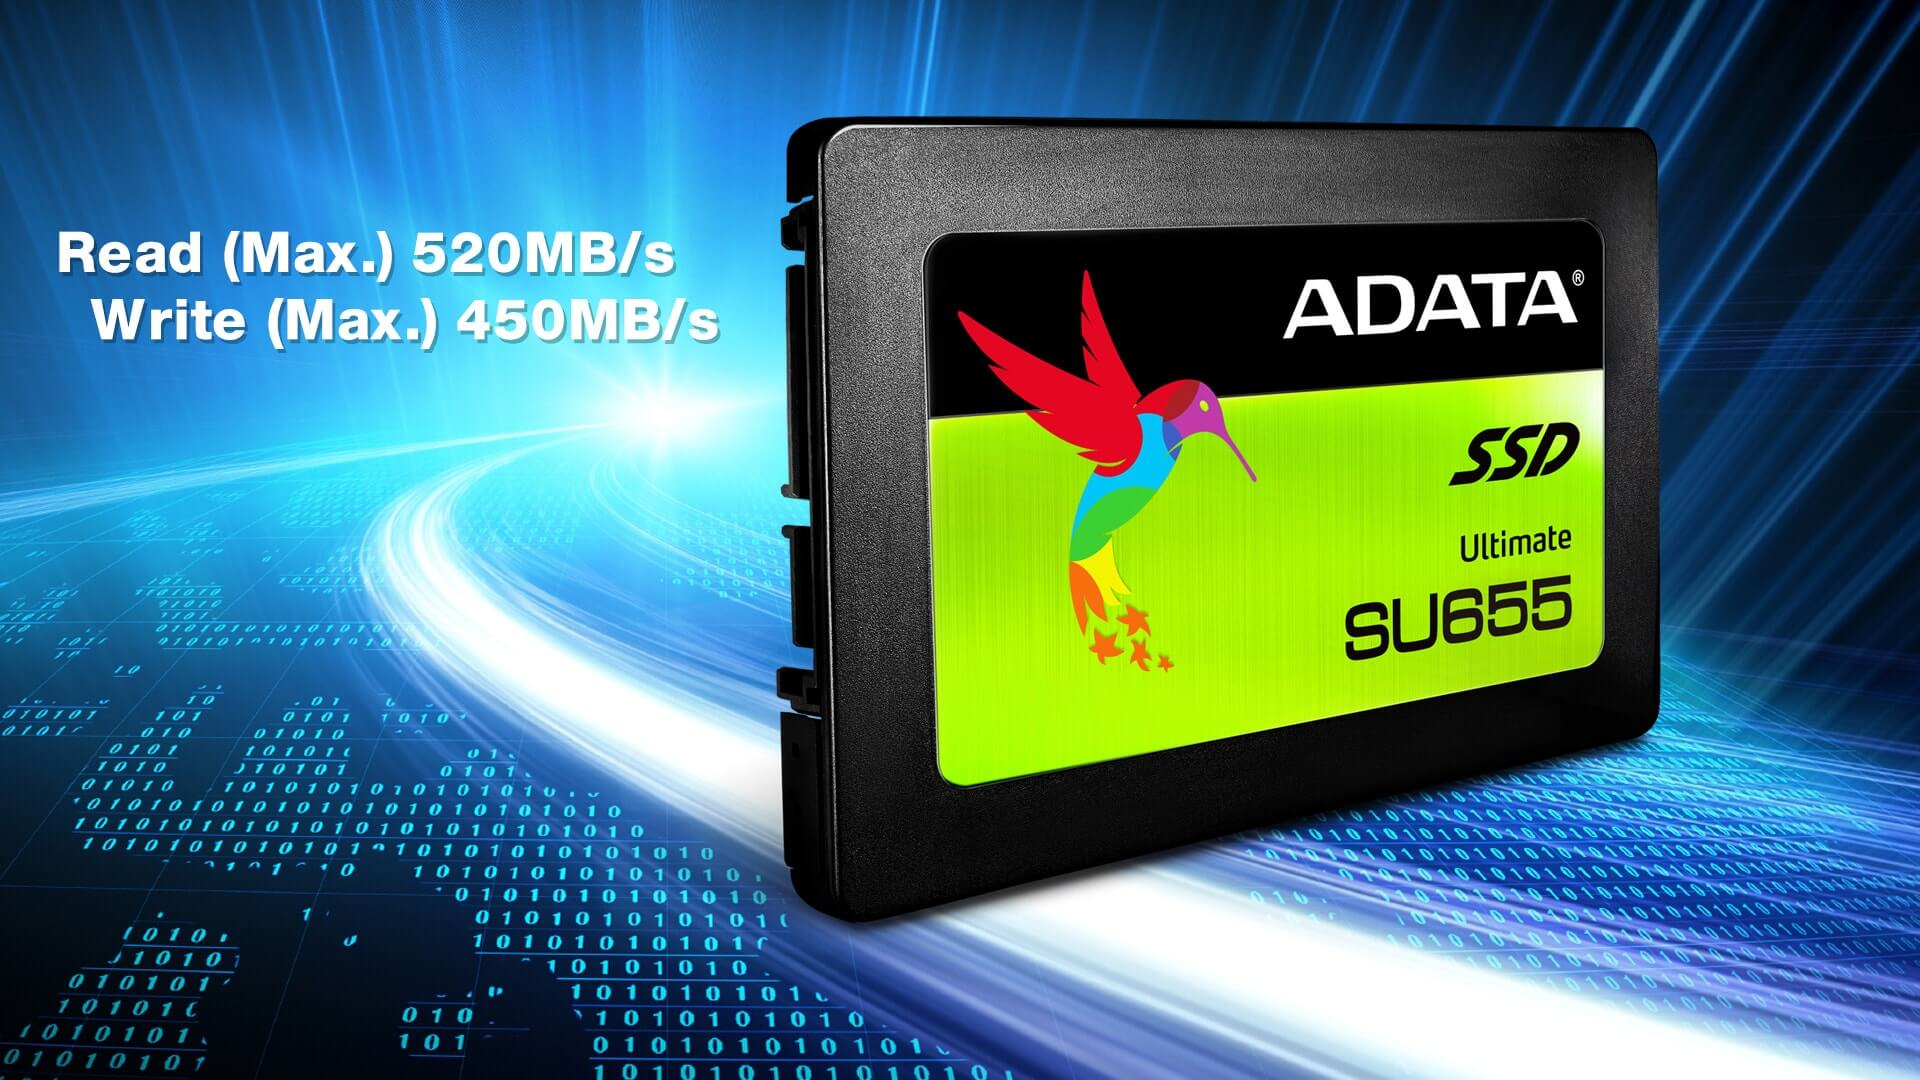 اس اس دی ای دیتا Adata SSD Ultimate SU655 120GB